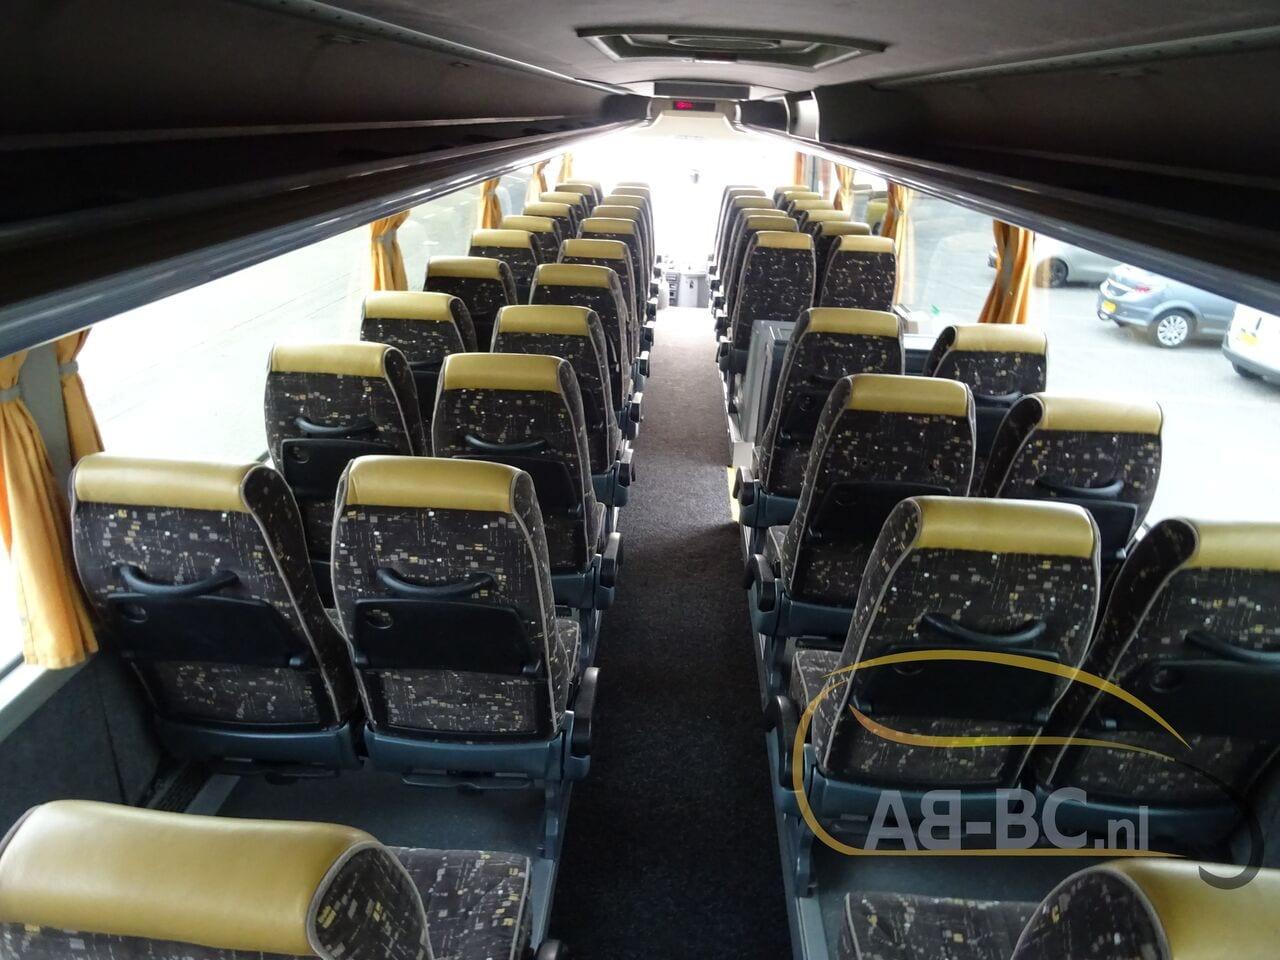 coach-busTEMSA-Safari-HD-51-Seats-EURO5-12-MTR---1614266662666176467_big_d5e0f031fc4a8b86c76b4ebada572350--19052917224730818200